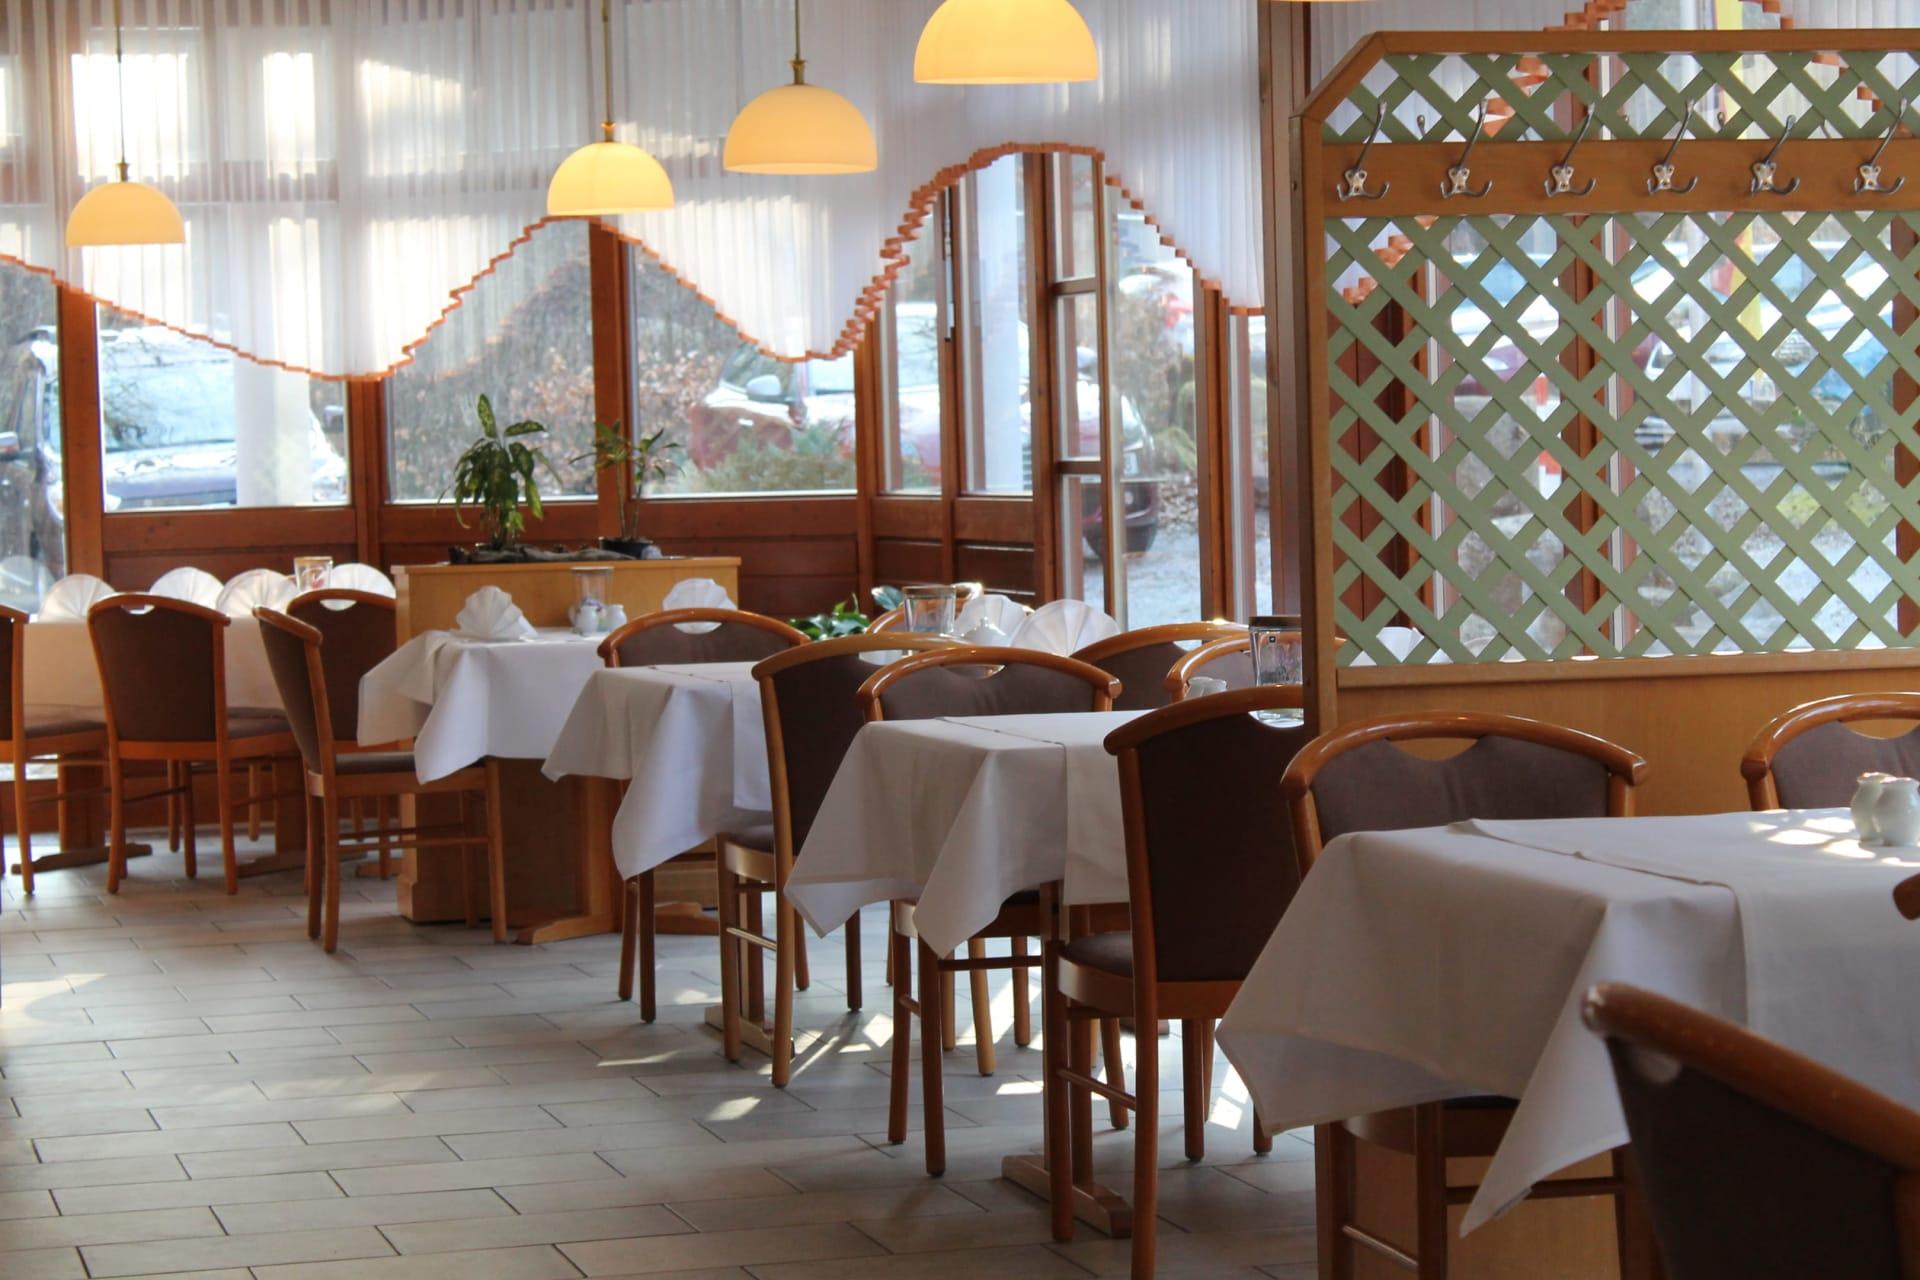 Flair Kurpark Hotel im Ilsetal